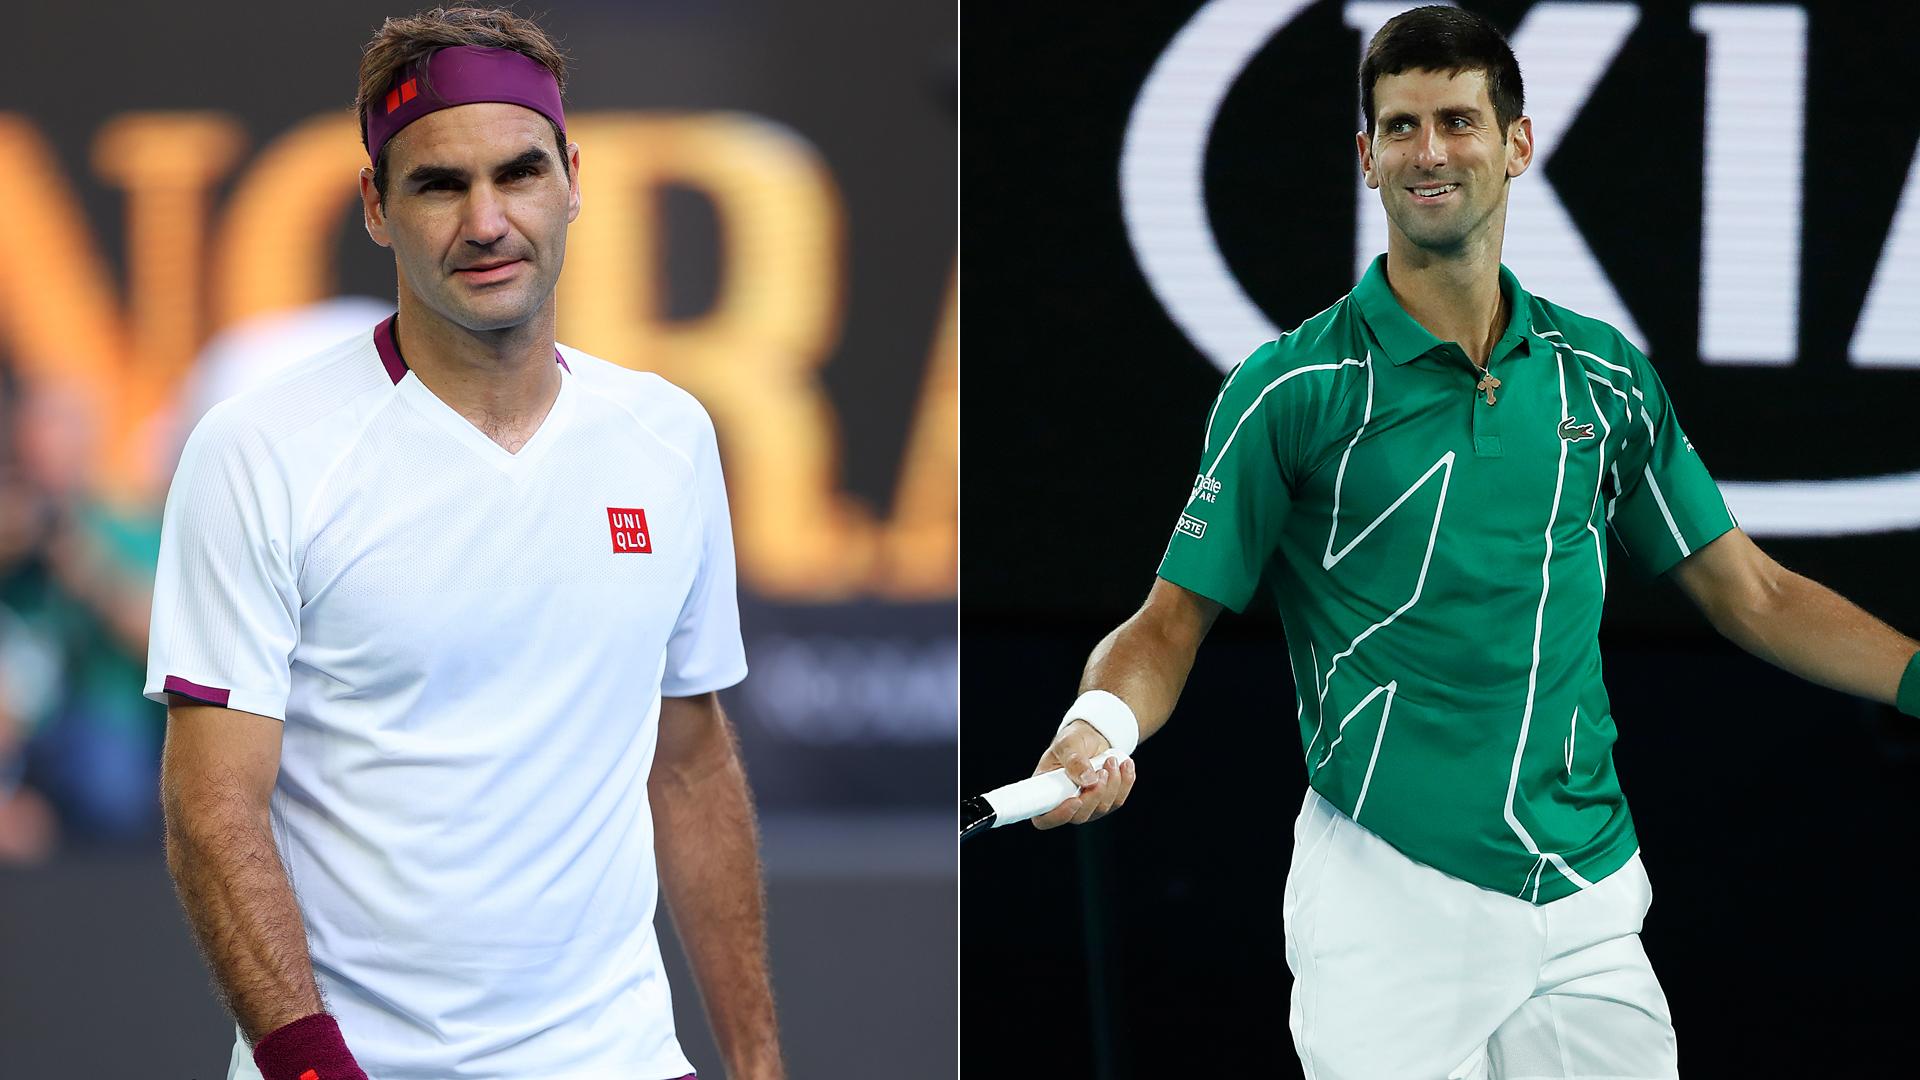 We take a closer look at Roger Federer and Novak Djokovic ahead of their Australian Open semi-final.